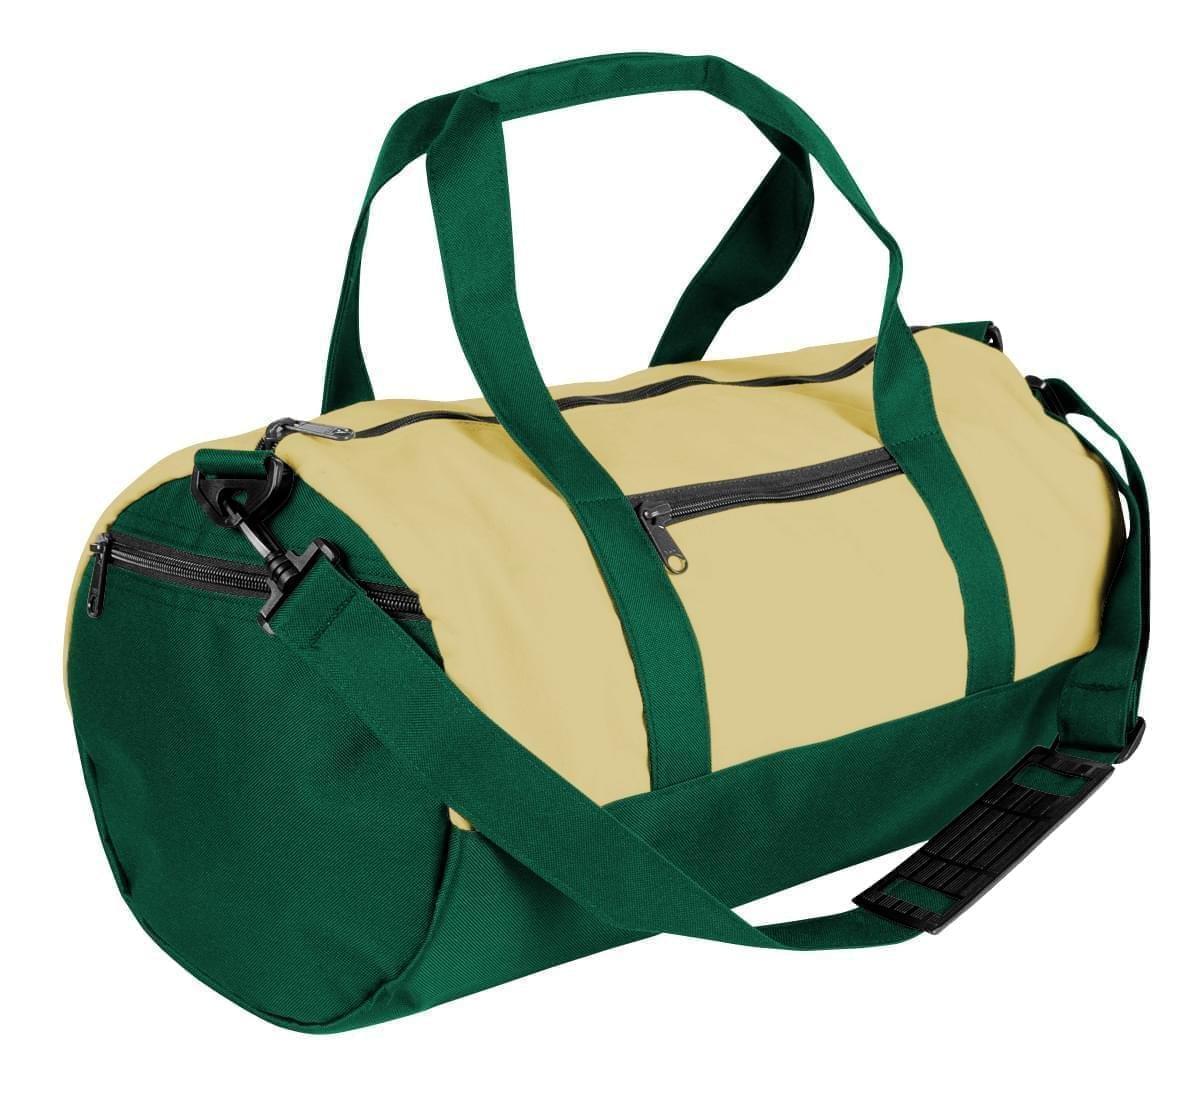 USA Made Heavy Canvas Athletic Barrel Bags, Natural-Hunter Green, PMLXZ2AAVV